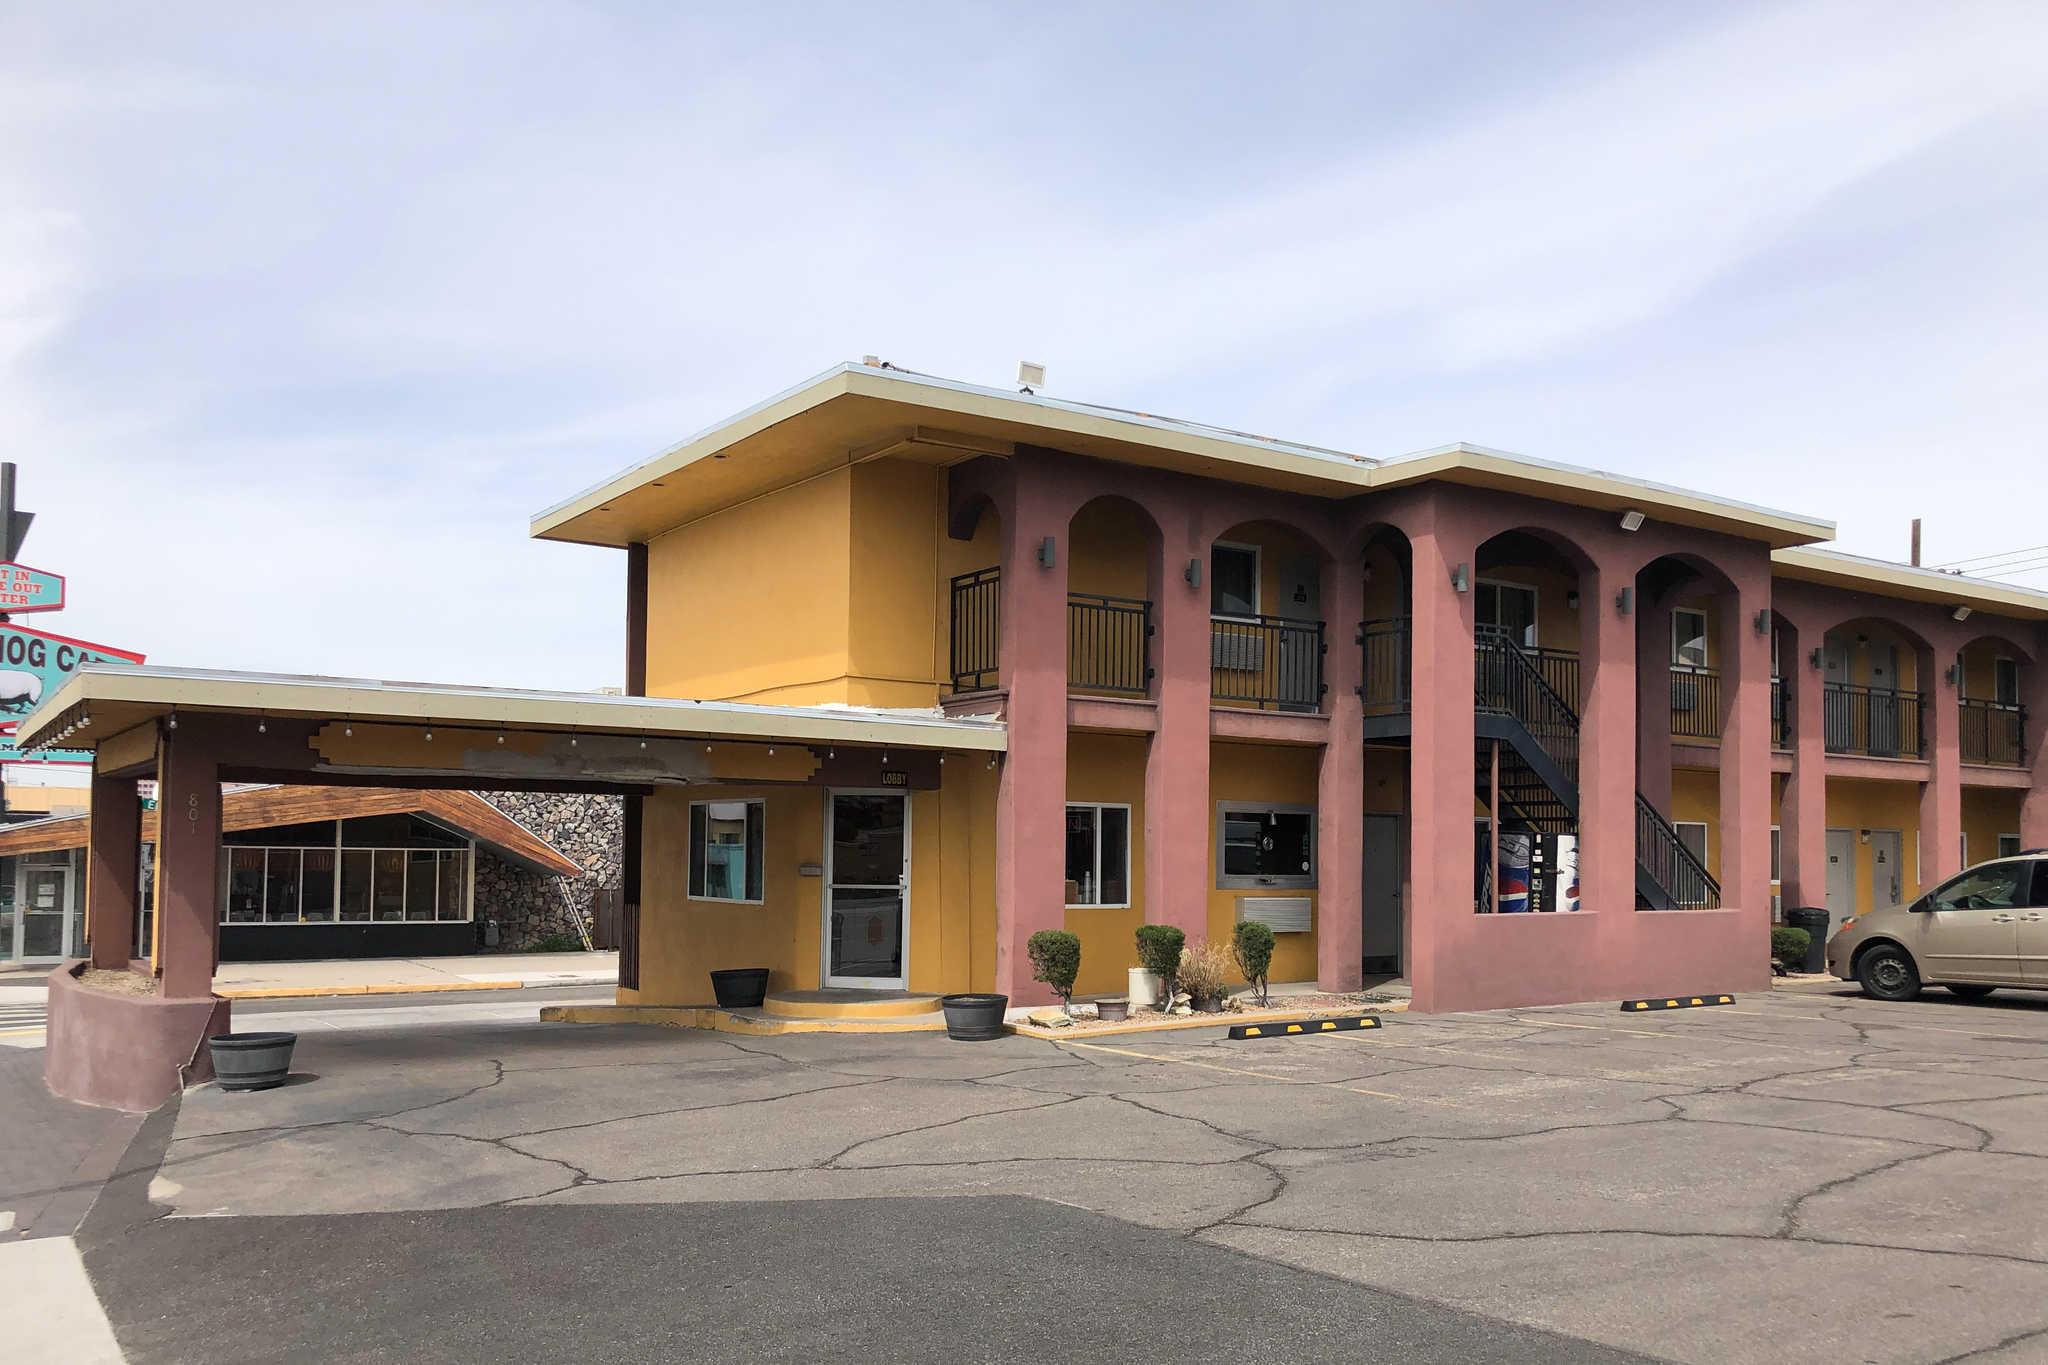 Rodeway Inn Albuquerque Downtown on Rt 66 image 0